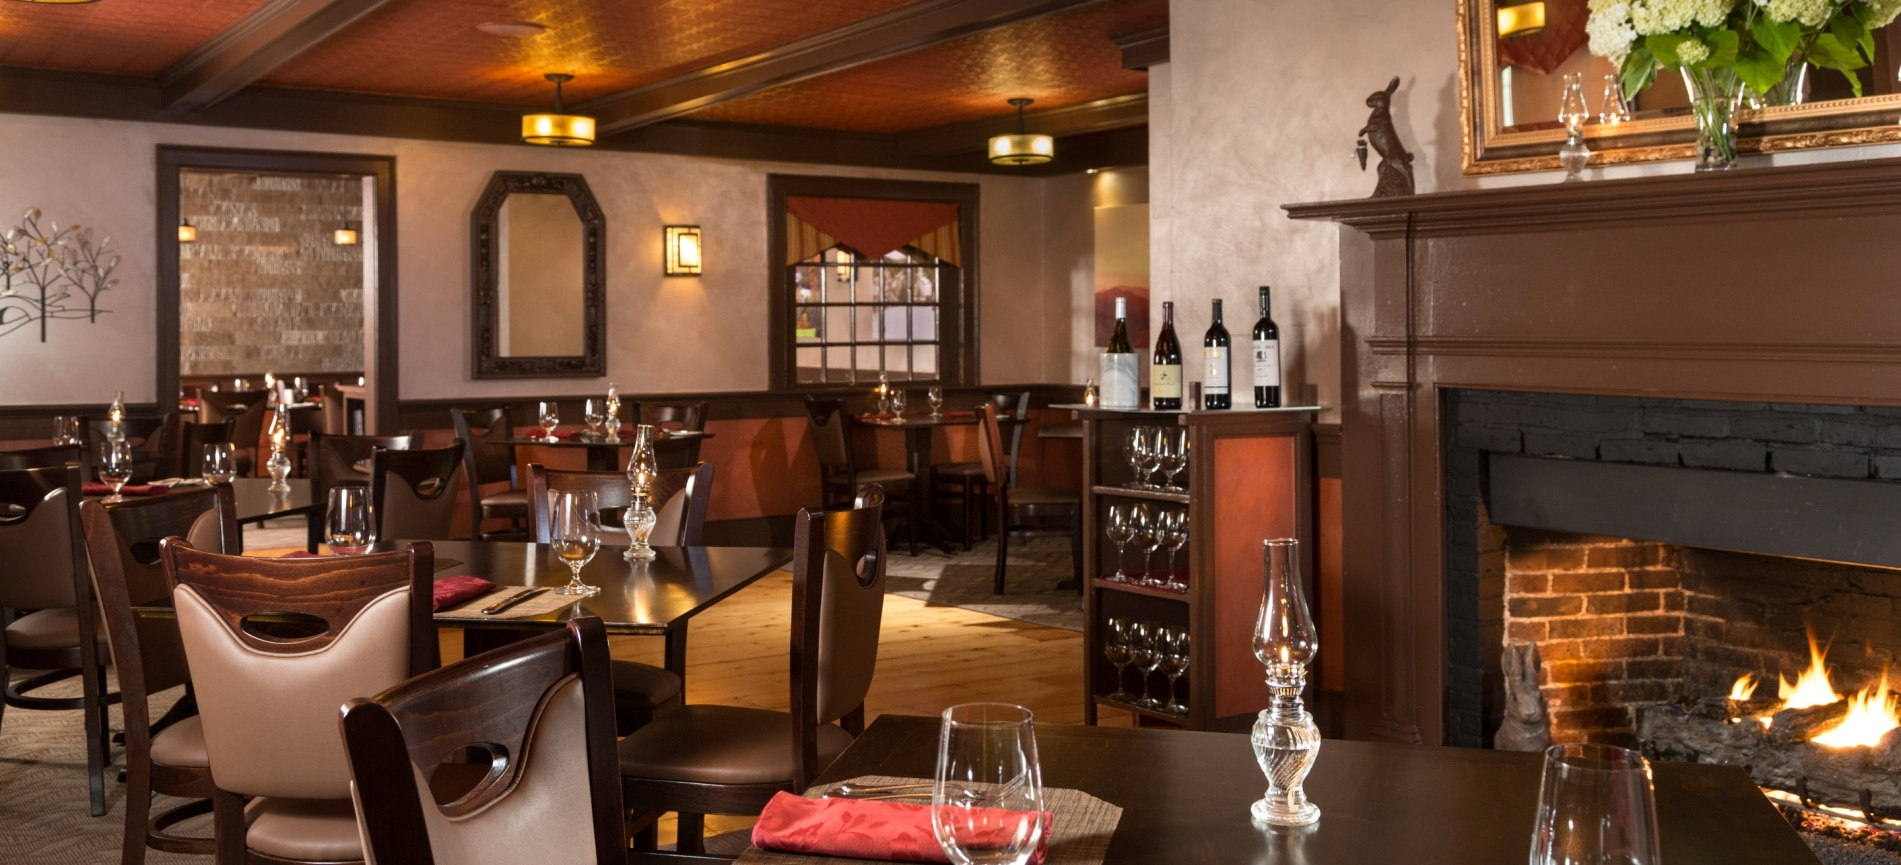 Rabbit Hill Inn: Fine Dining